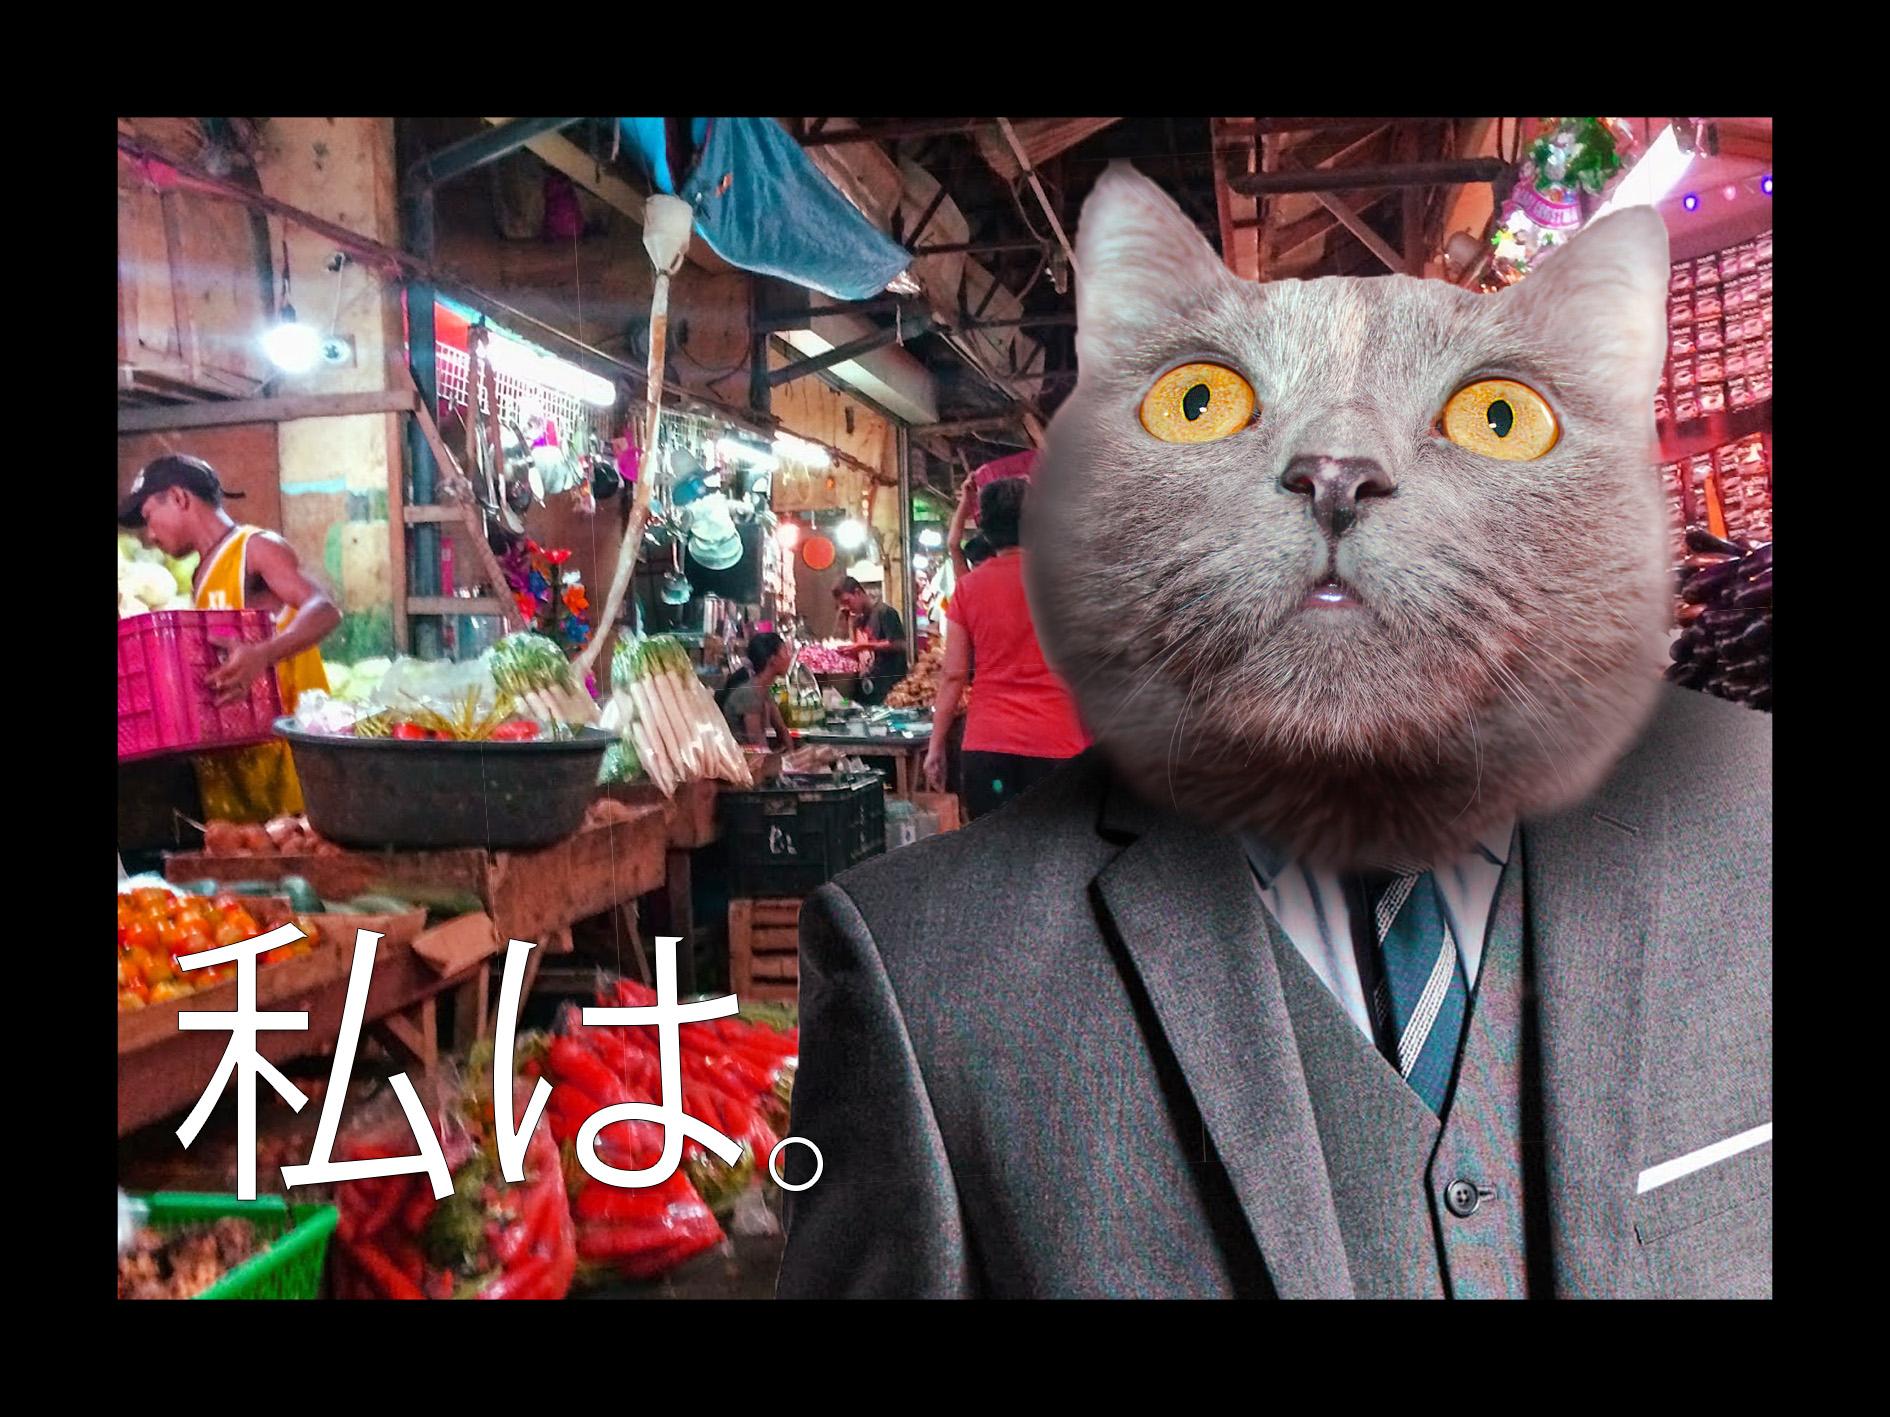 Cat in the market by DenAltVega